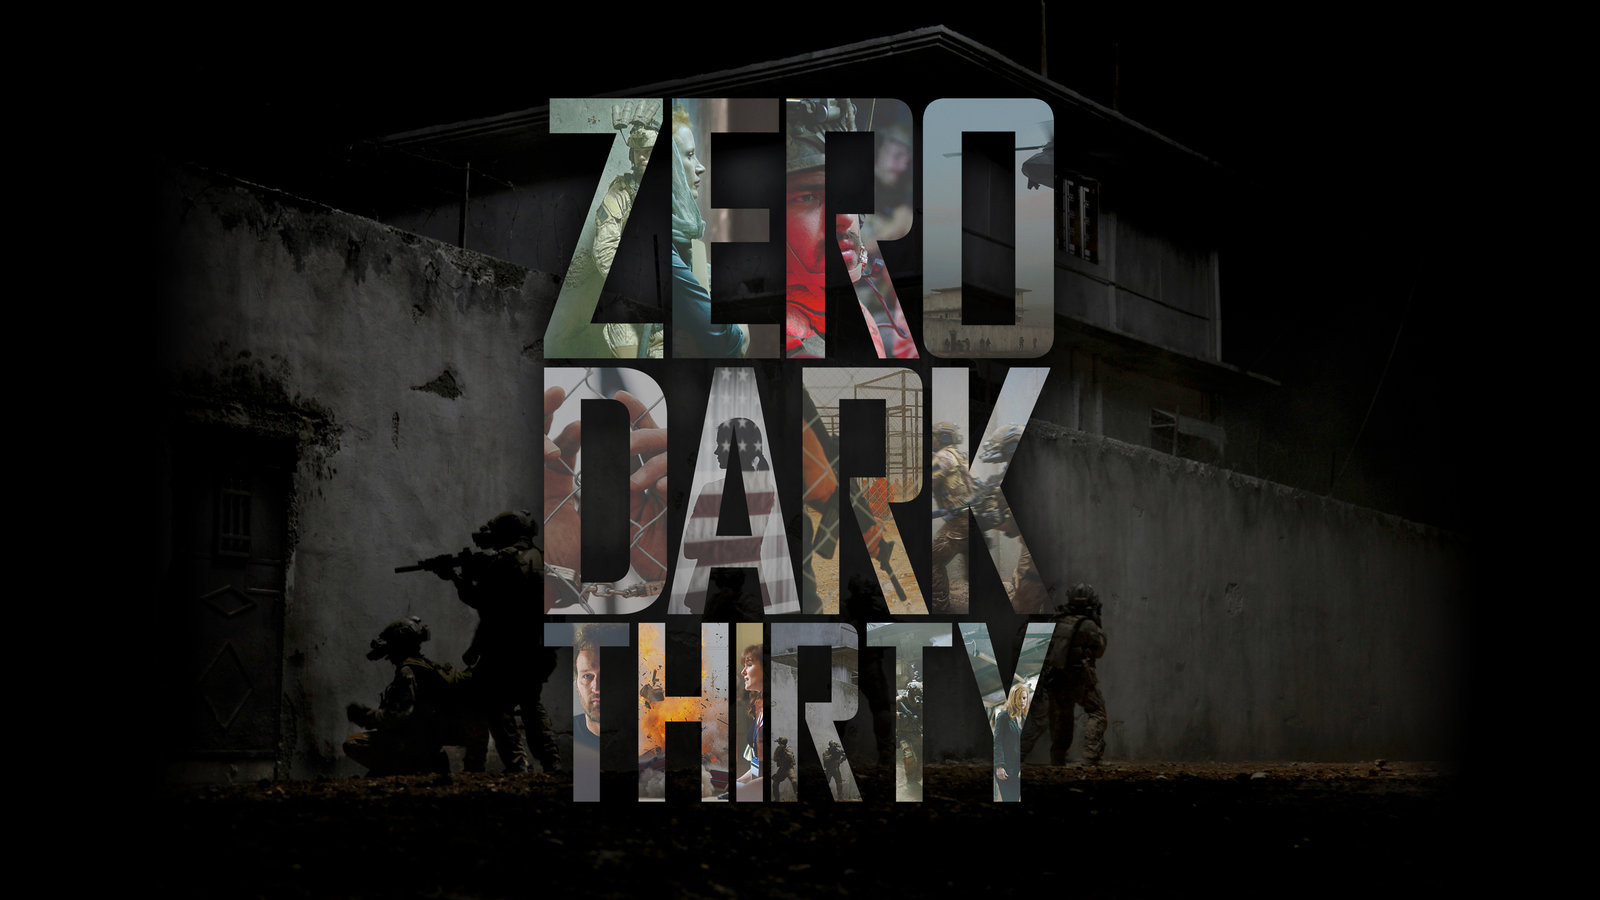 zero dark thirty wallpaper 4k by naimvb fan art wallpaper movies tv 1600x900